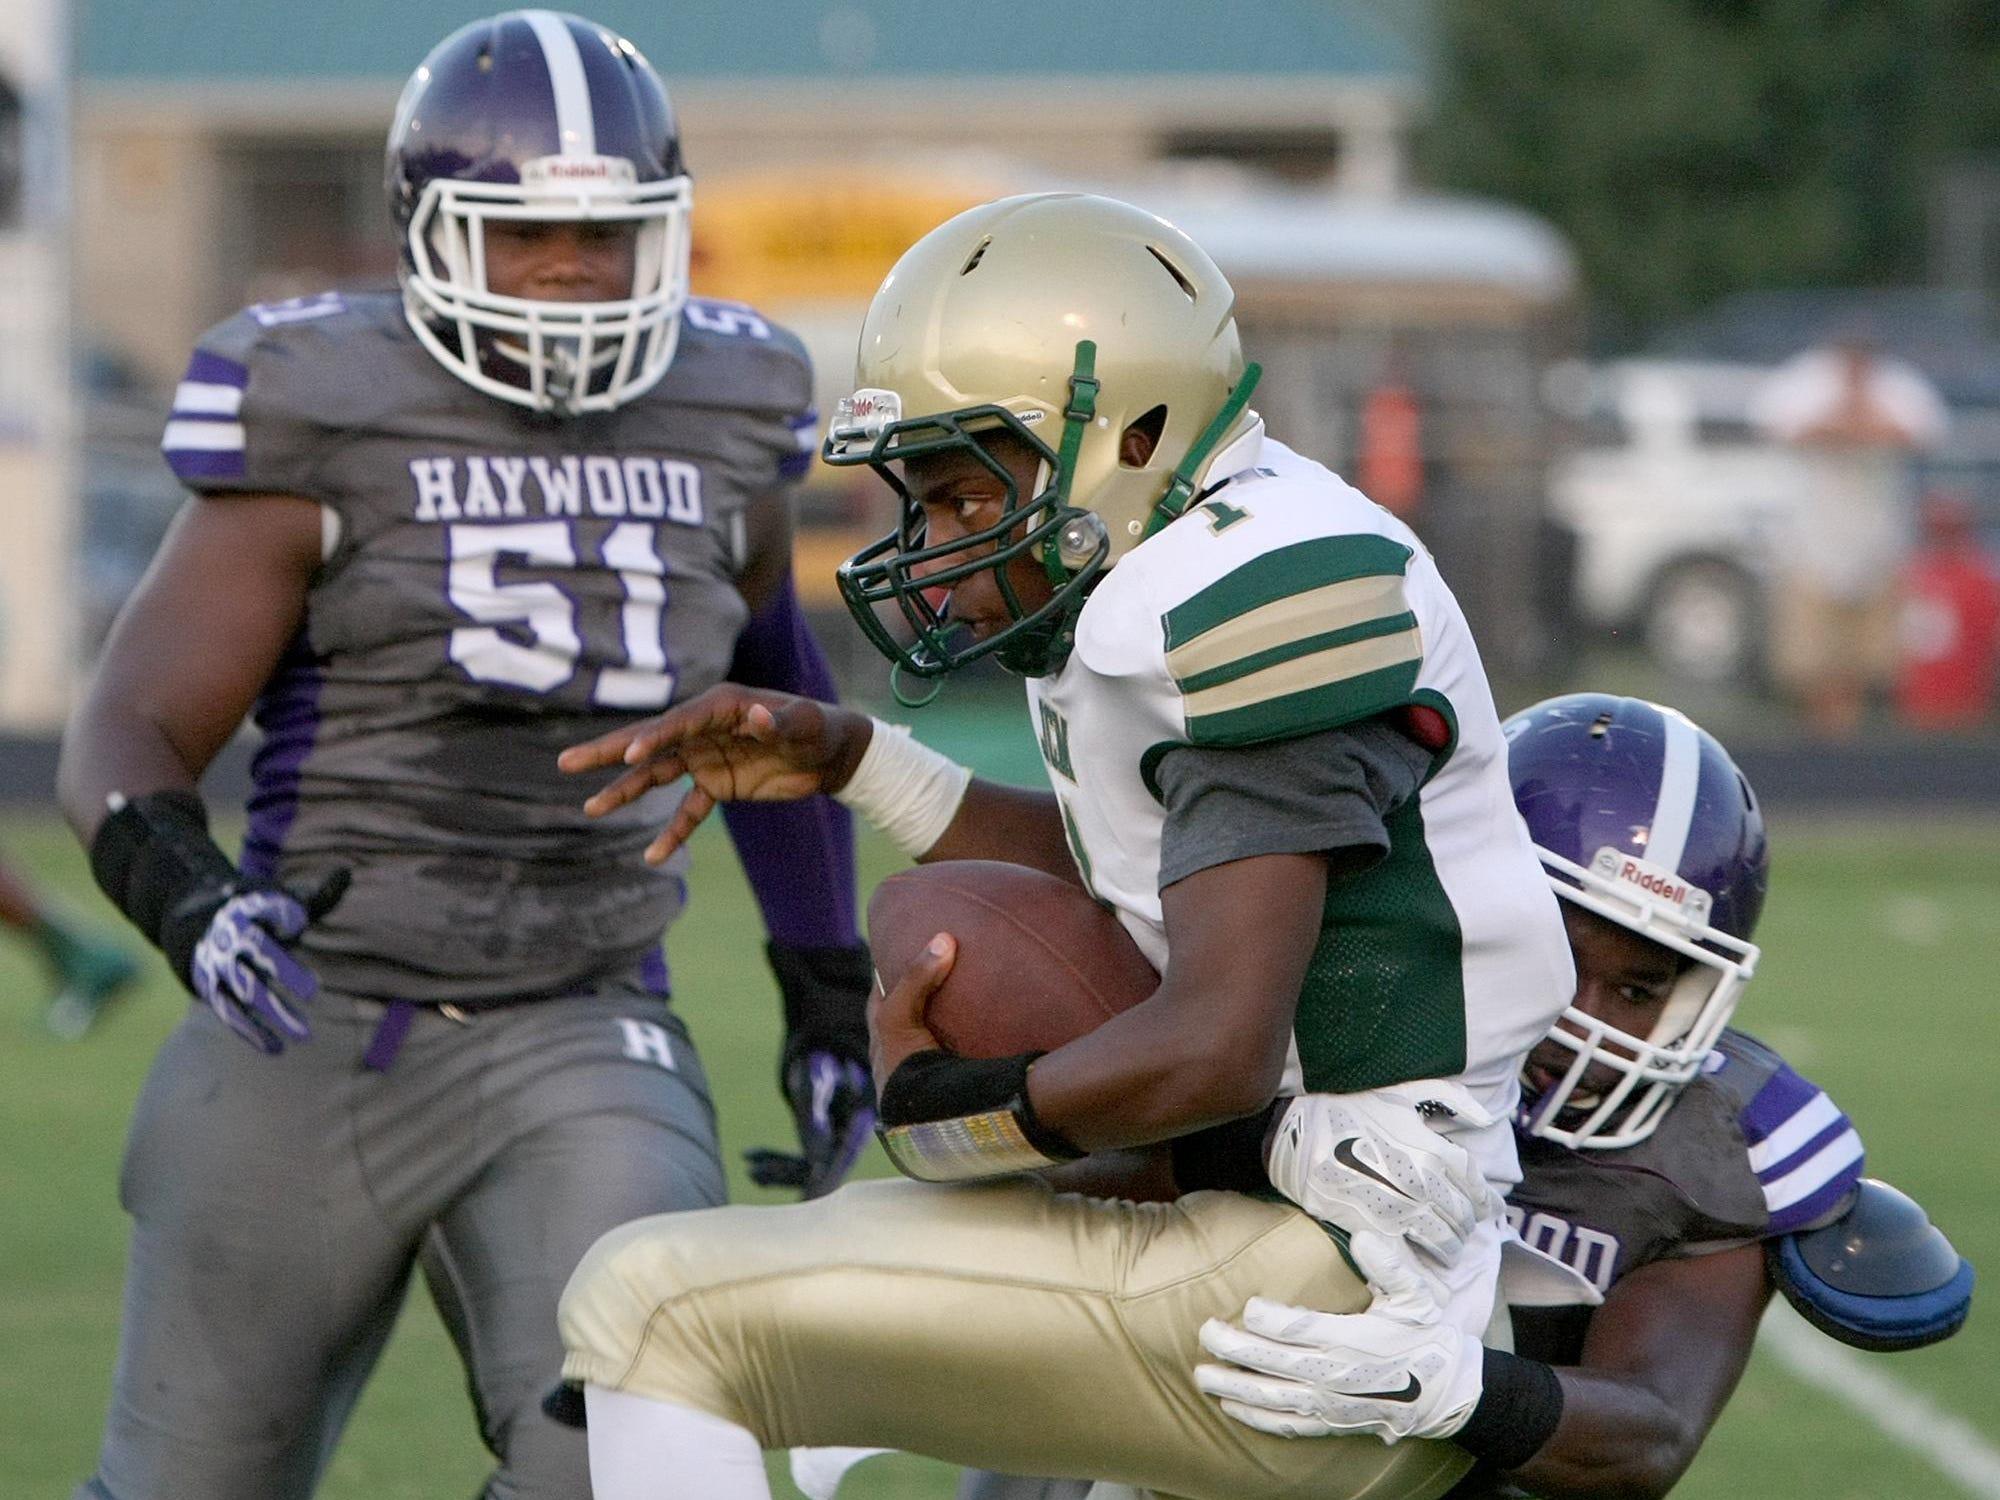 JCM quarterback Adryan Grundy is hit by Haywood linebacker Jaleel Turner at John B. Hooper Memorial Stadium in Brownsville on Aug. 29.